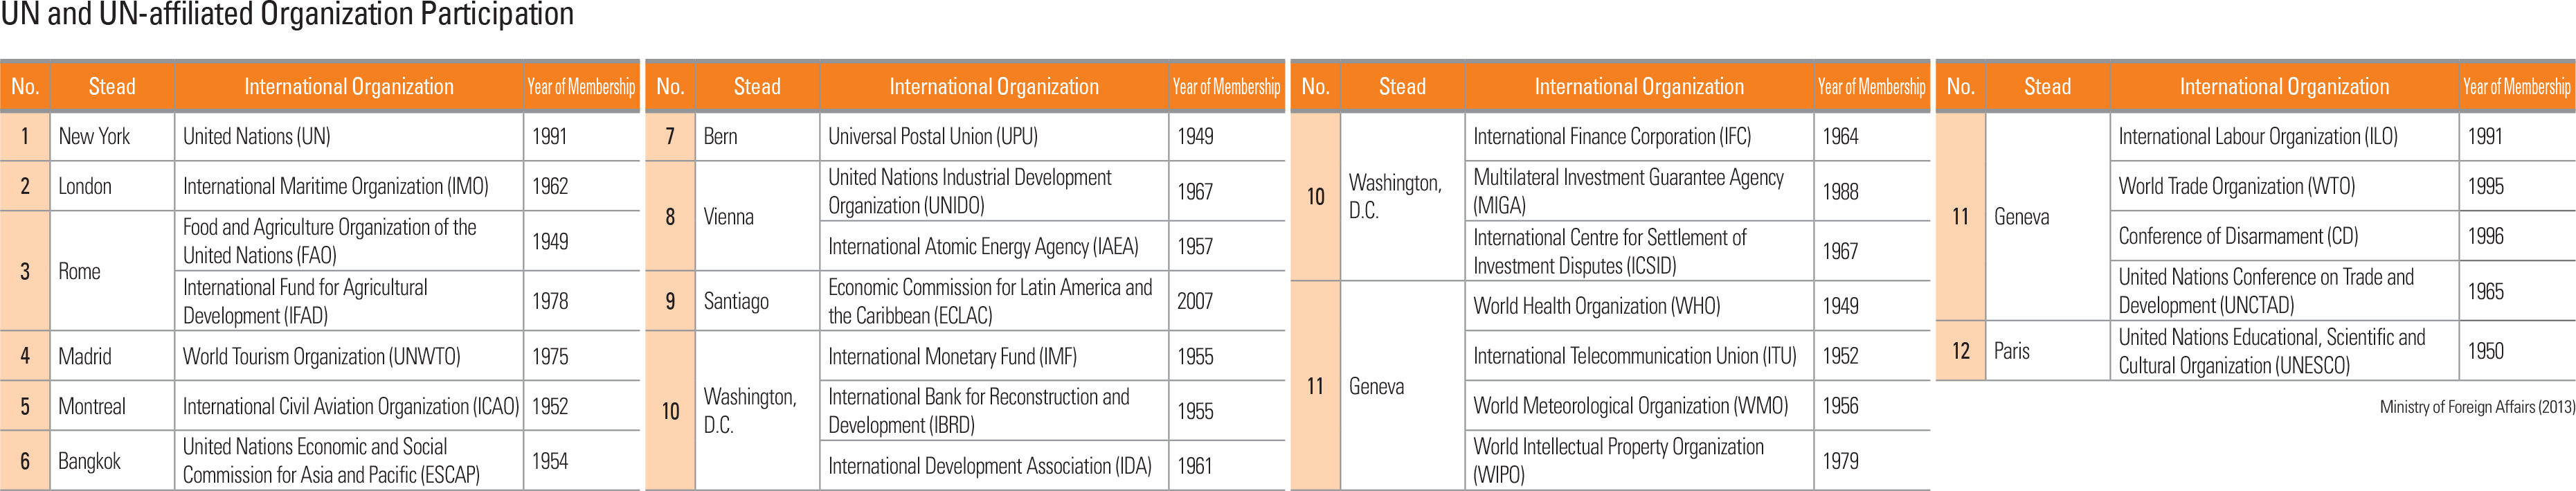 UN and UN-affiliated Organization Participation